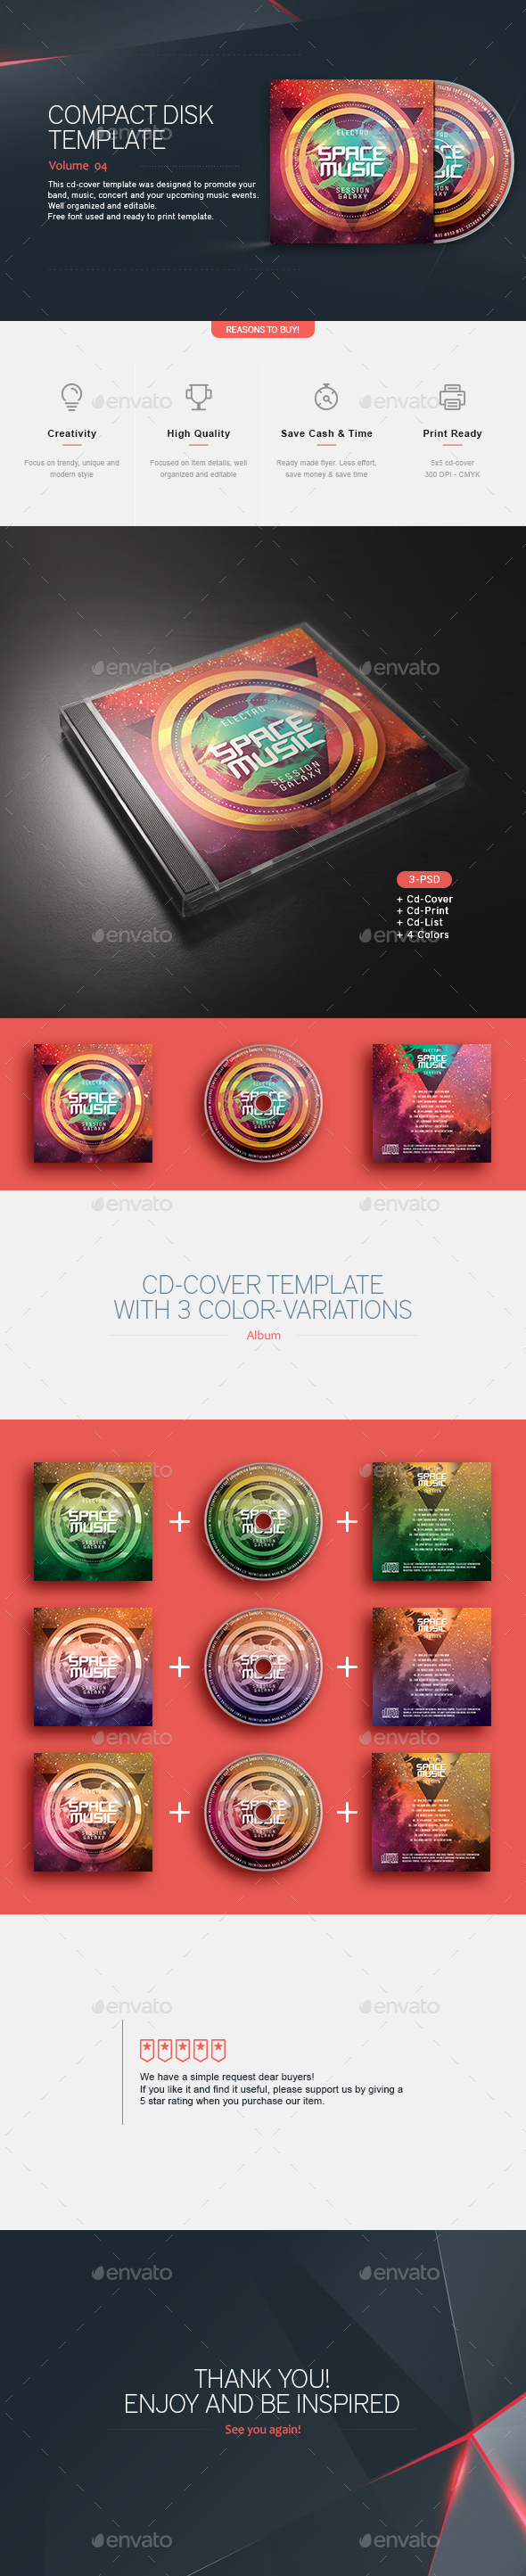 Space Music - CD Template - CD & DVD Artwork Print Templates